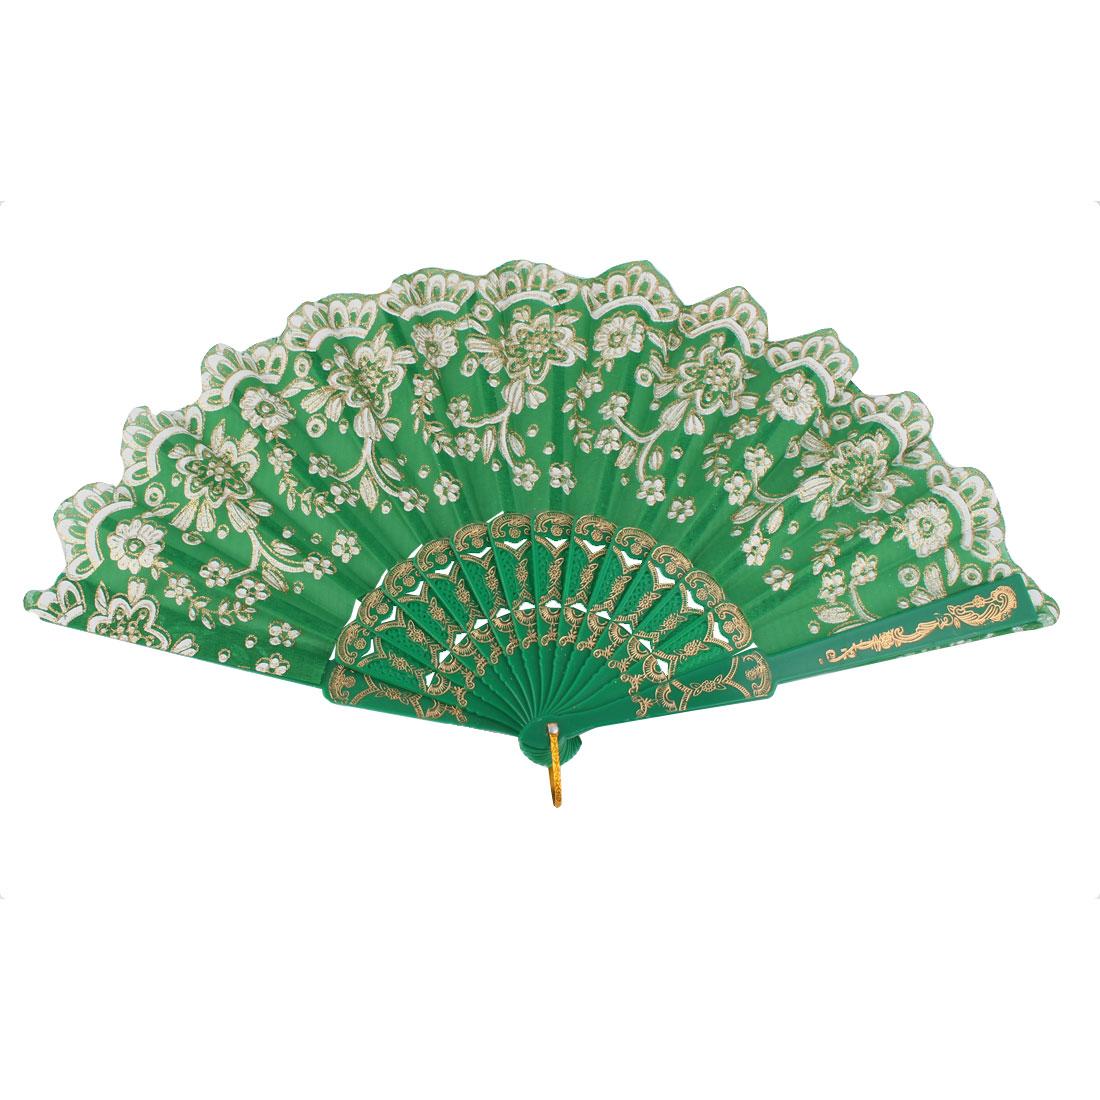 Dancing Wedding Chinese Style Flower Pattern Folding Hand Fan Green White